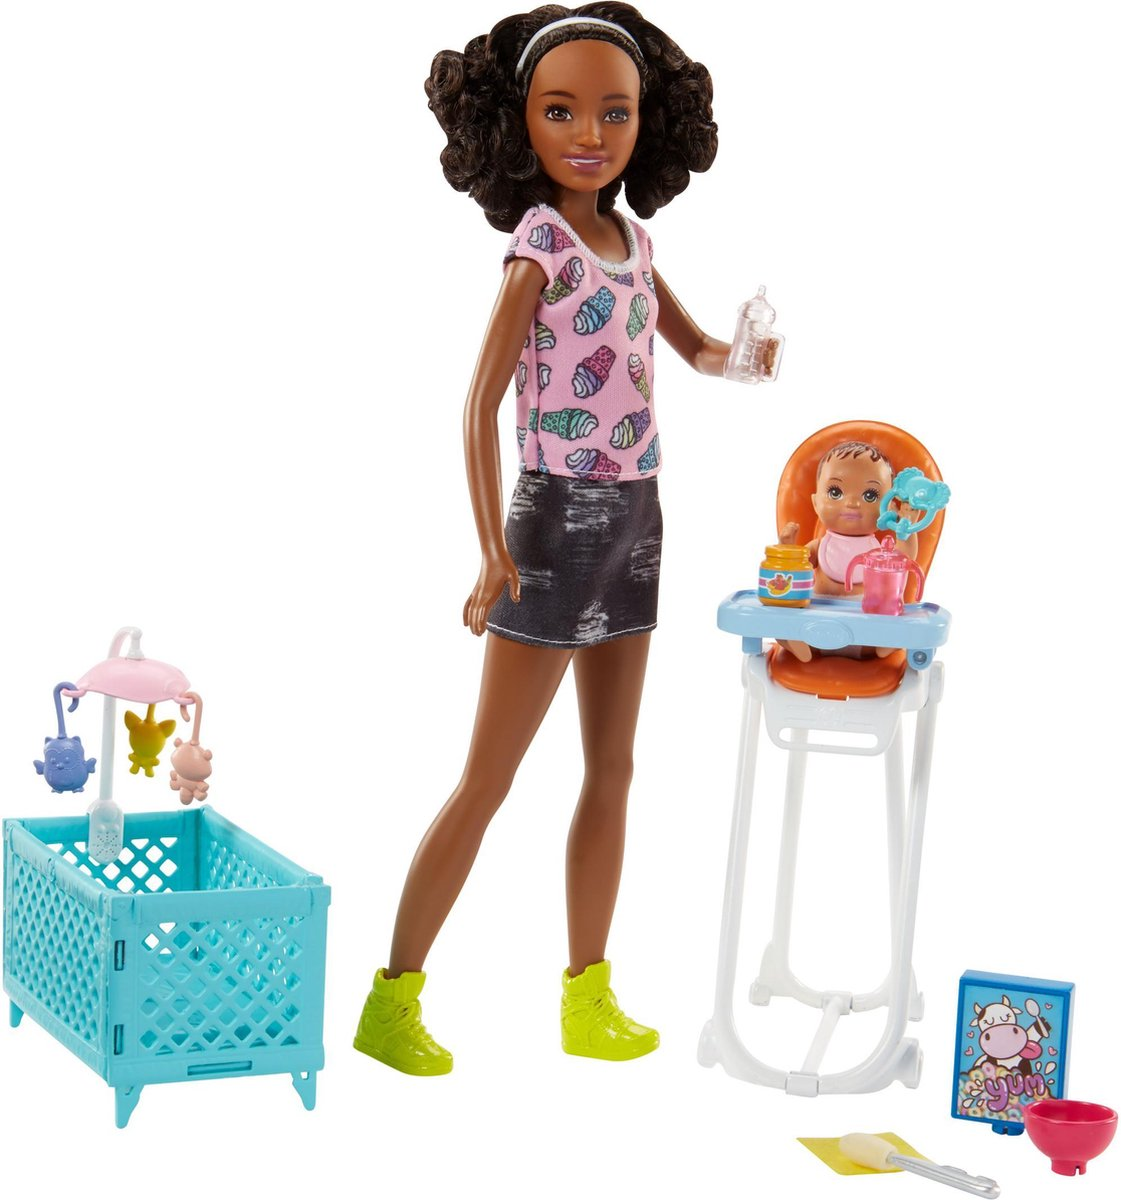 Barbie Babysitter met Kinderstoel Set - Barbie